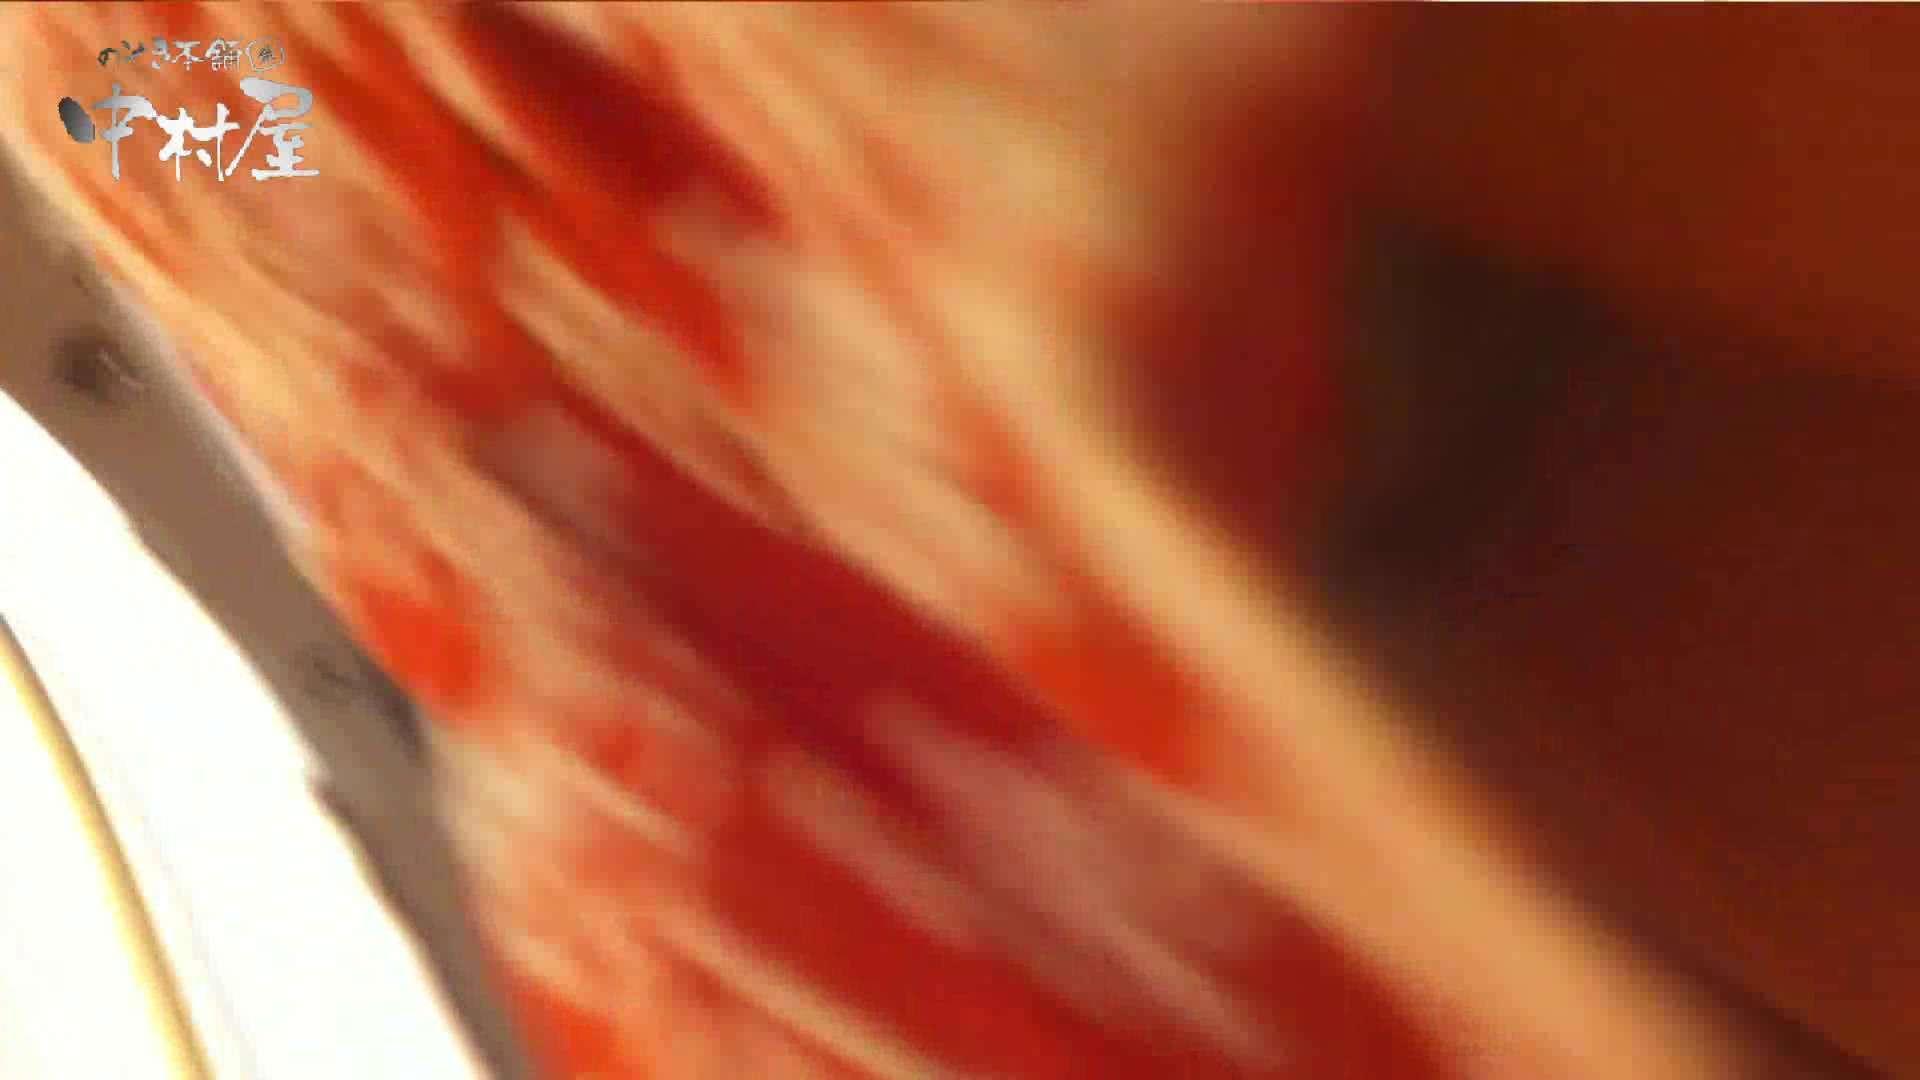 vol.43 可愛いカリスマ店員限定‼胸チラ&パンチラ 美脚おねーさんの胸元ゲット! 接写 エロ画像 68PIX 10